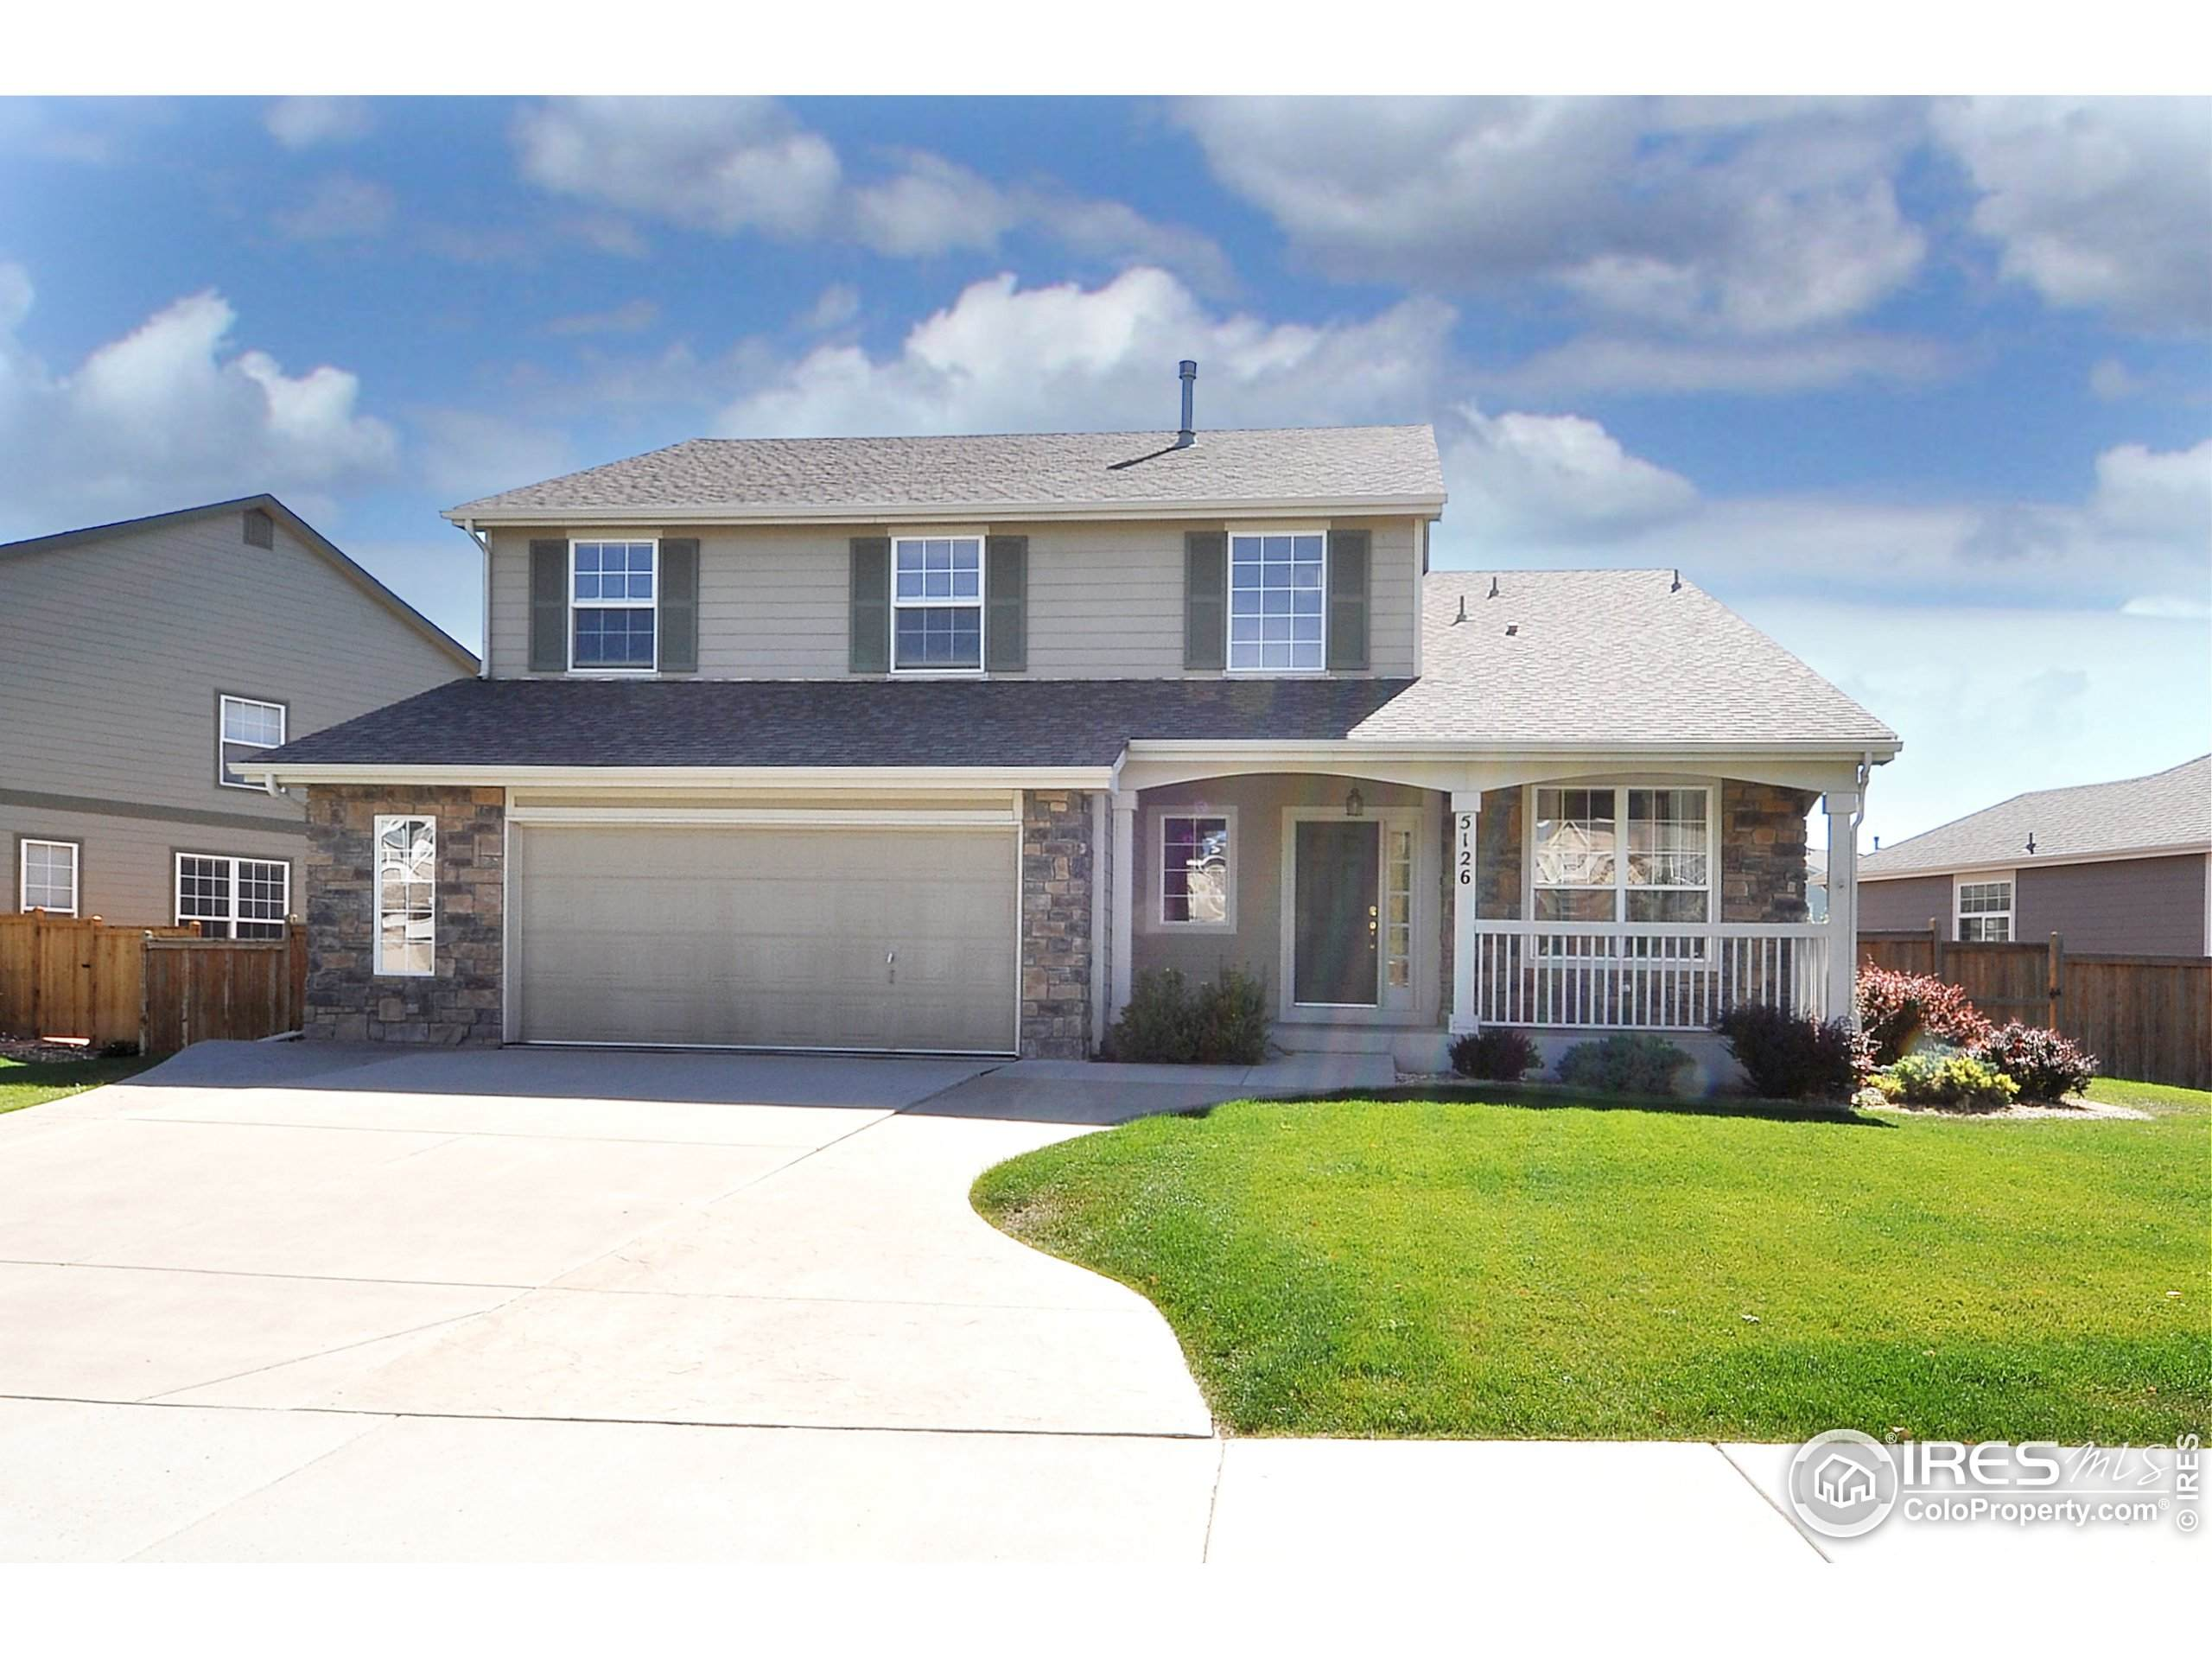 770 W Eisenhower Blvd, Loveland, CO 80537 (#940413) :: Mile High Luxury Real Estate